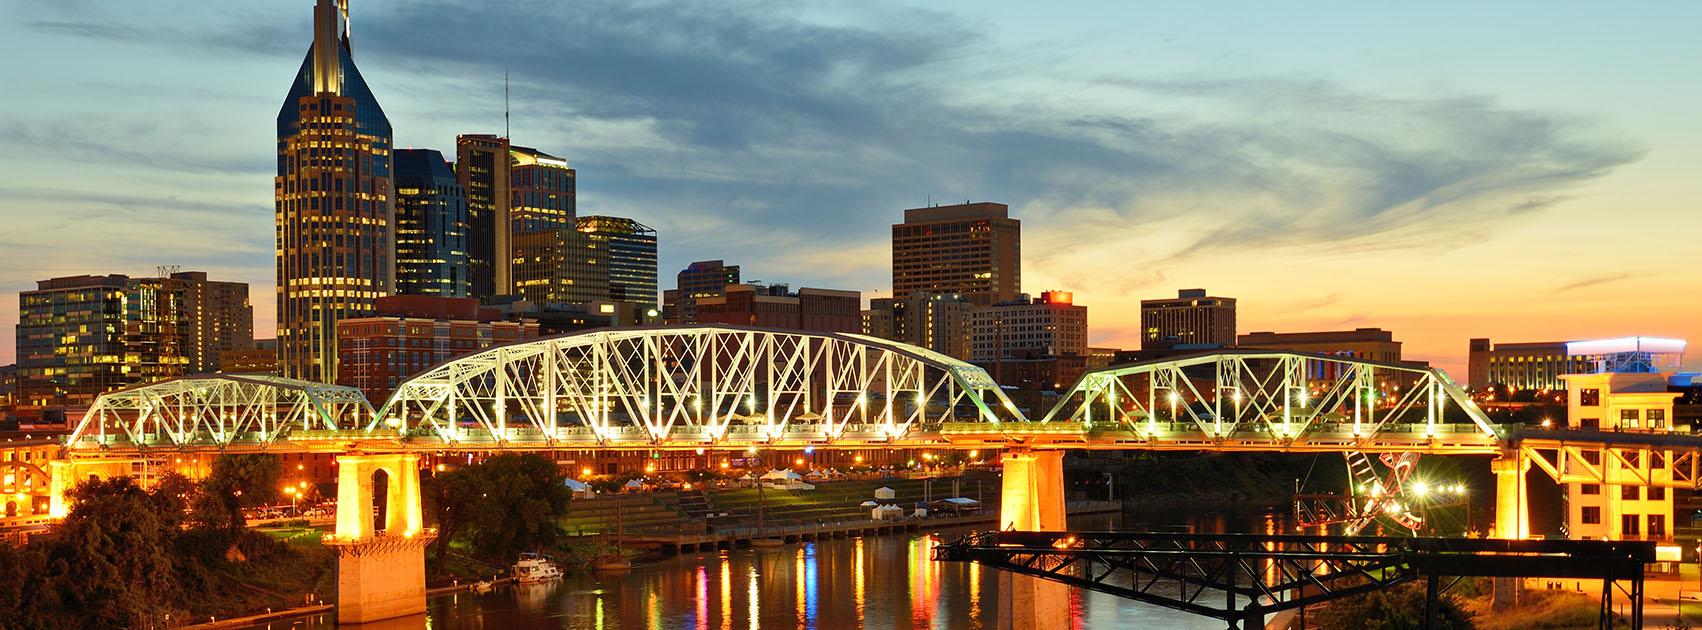 Bridge In Tennessee